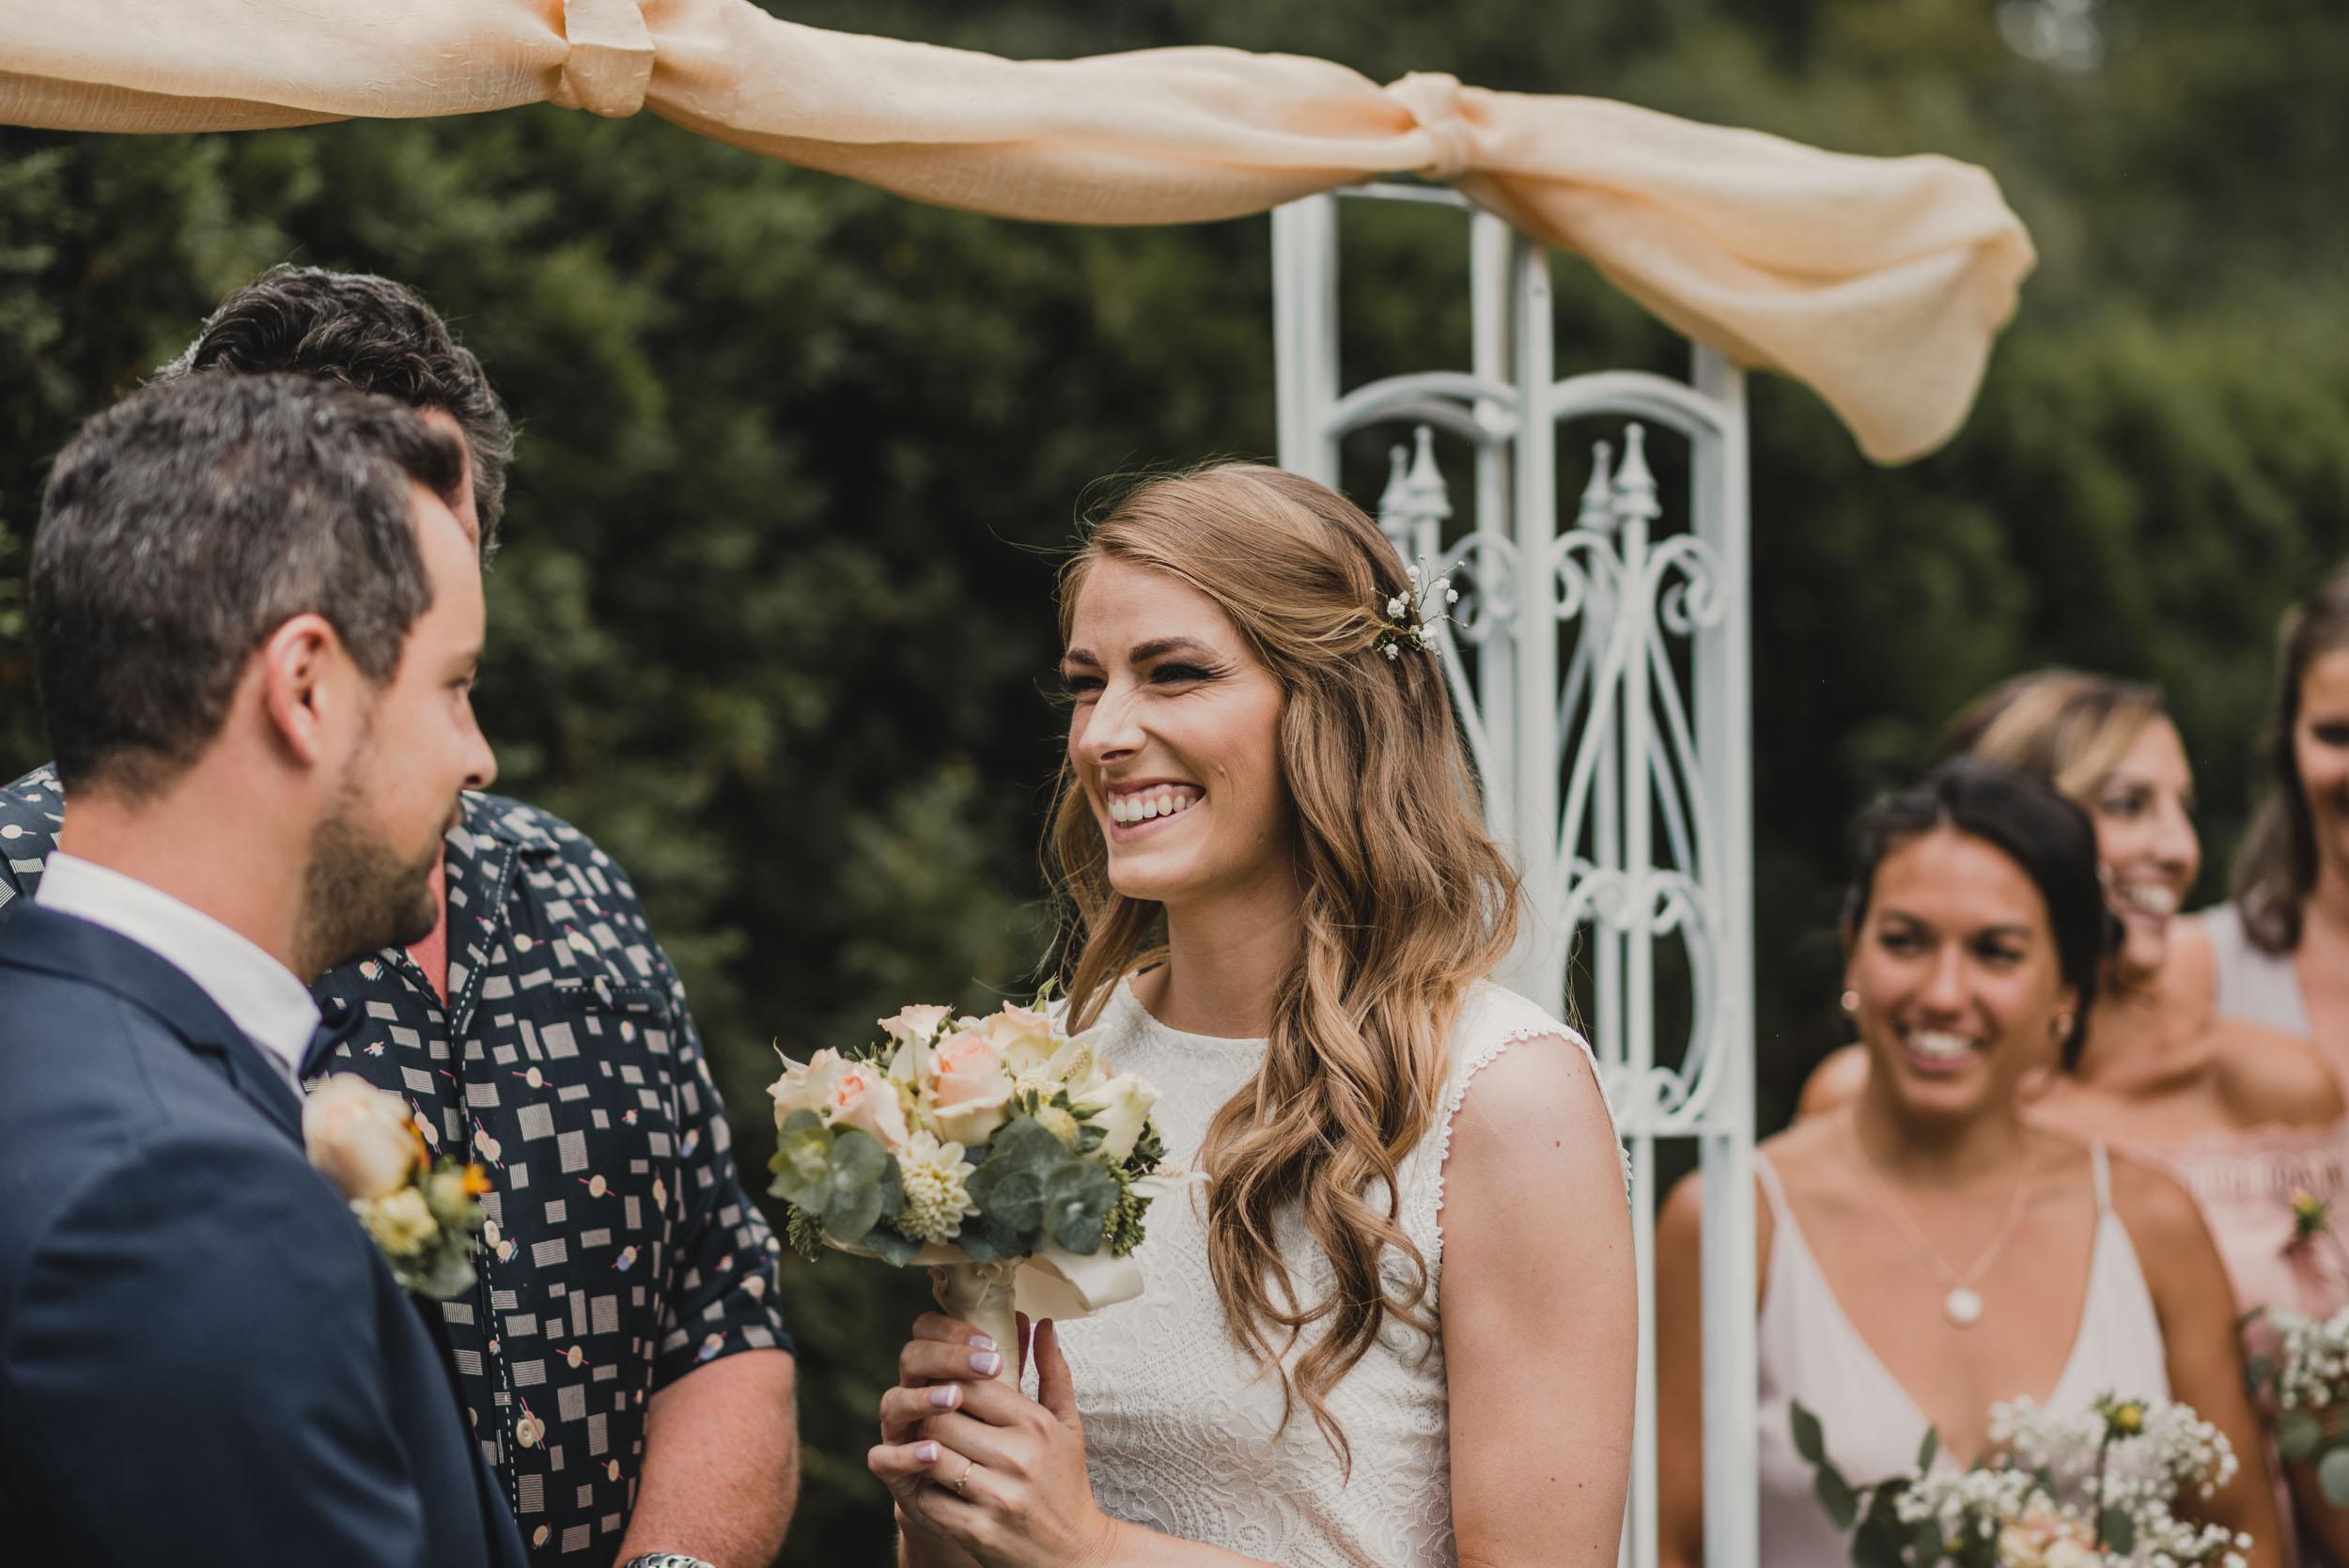 Bride smiling at groom at altar